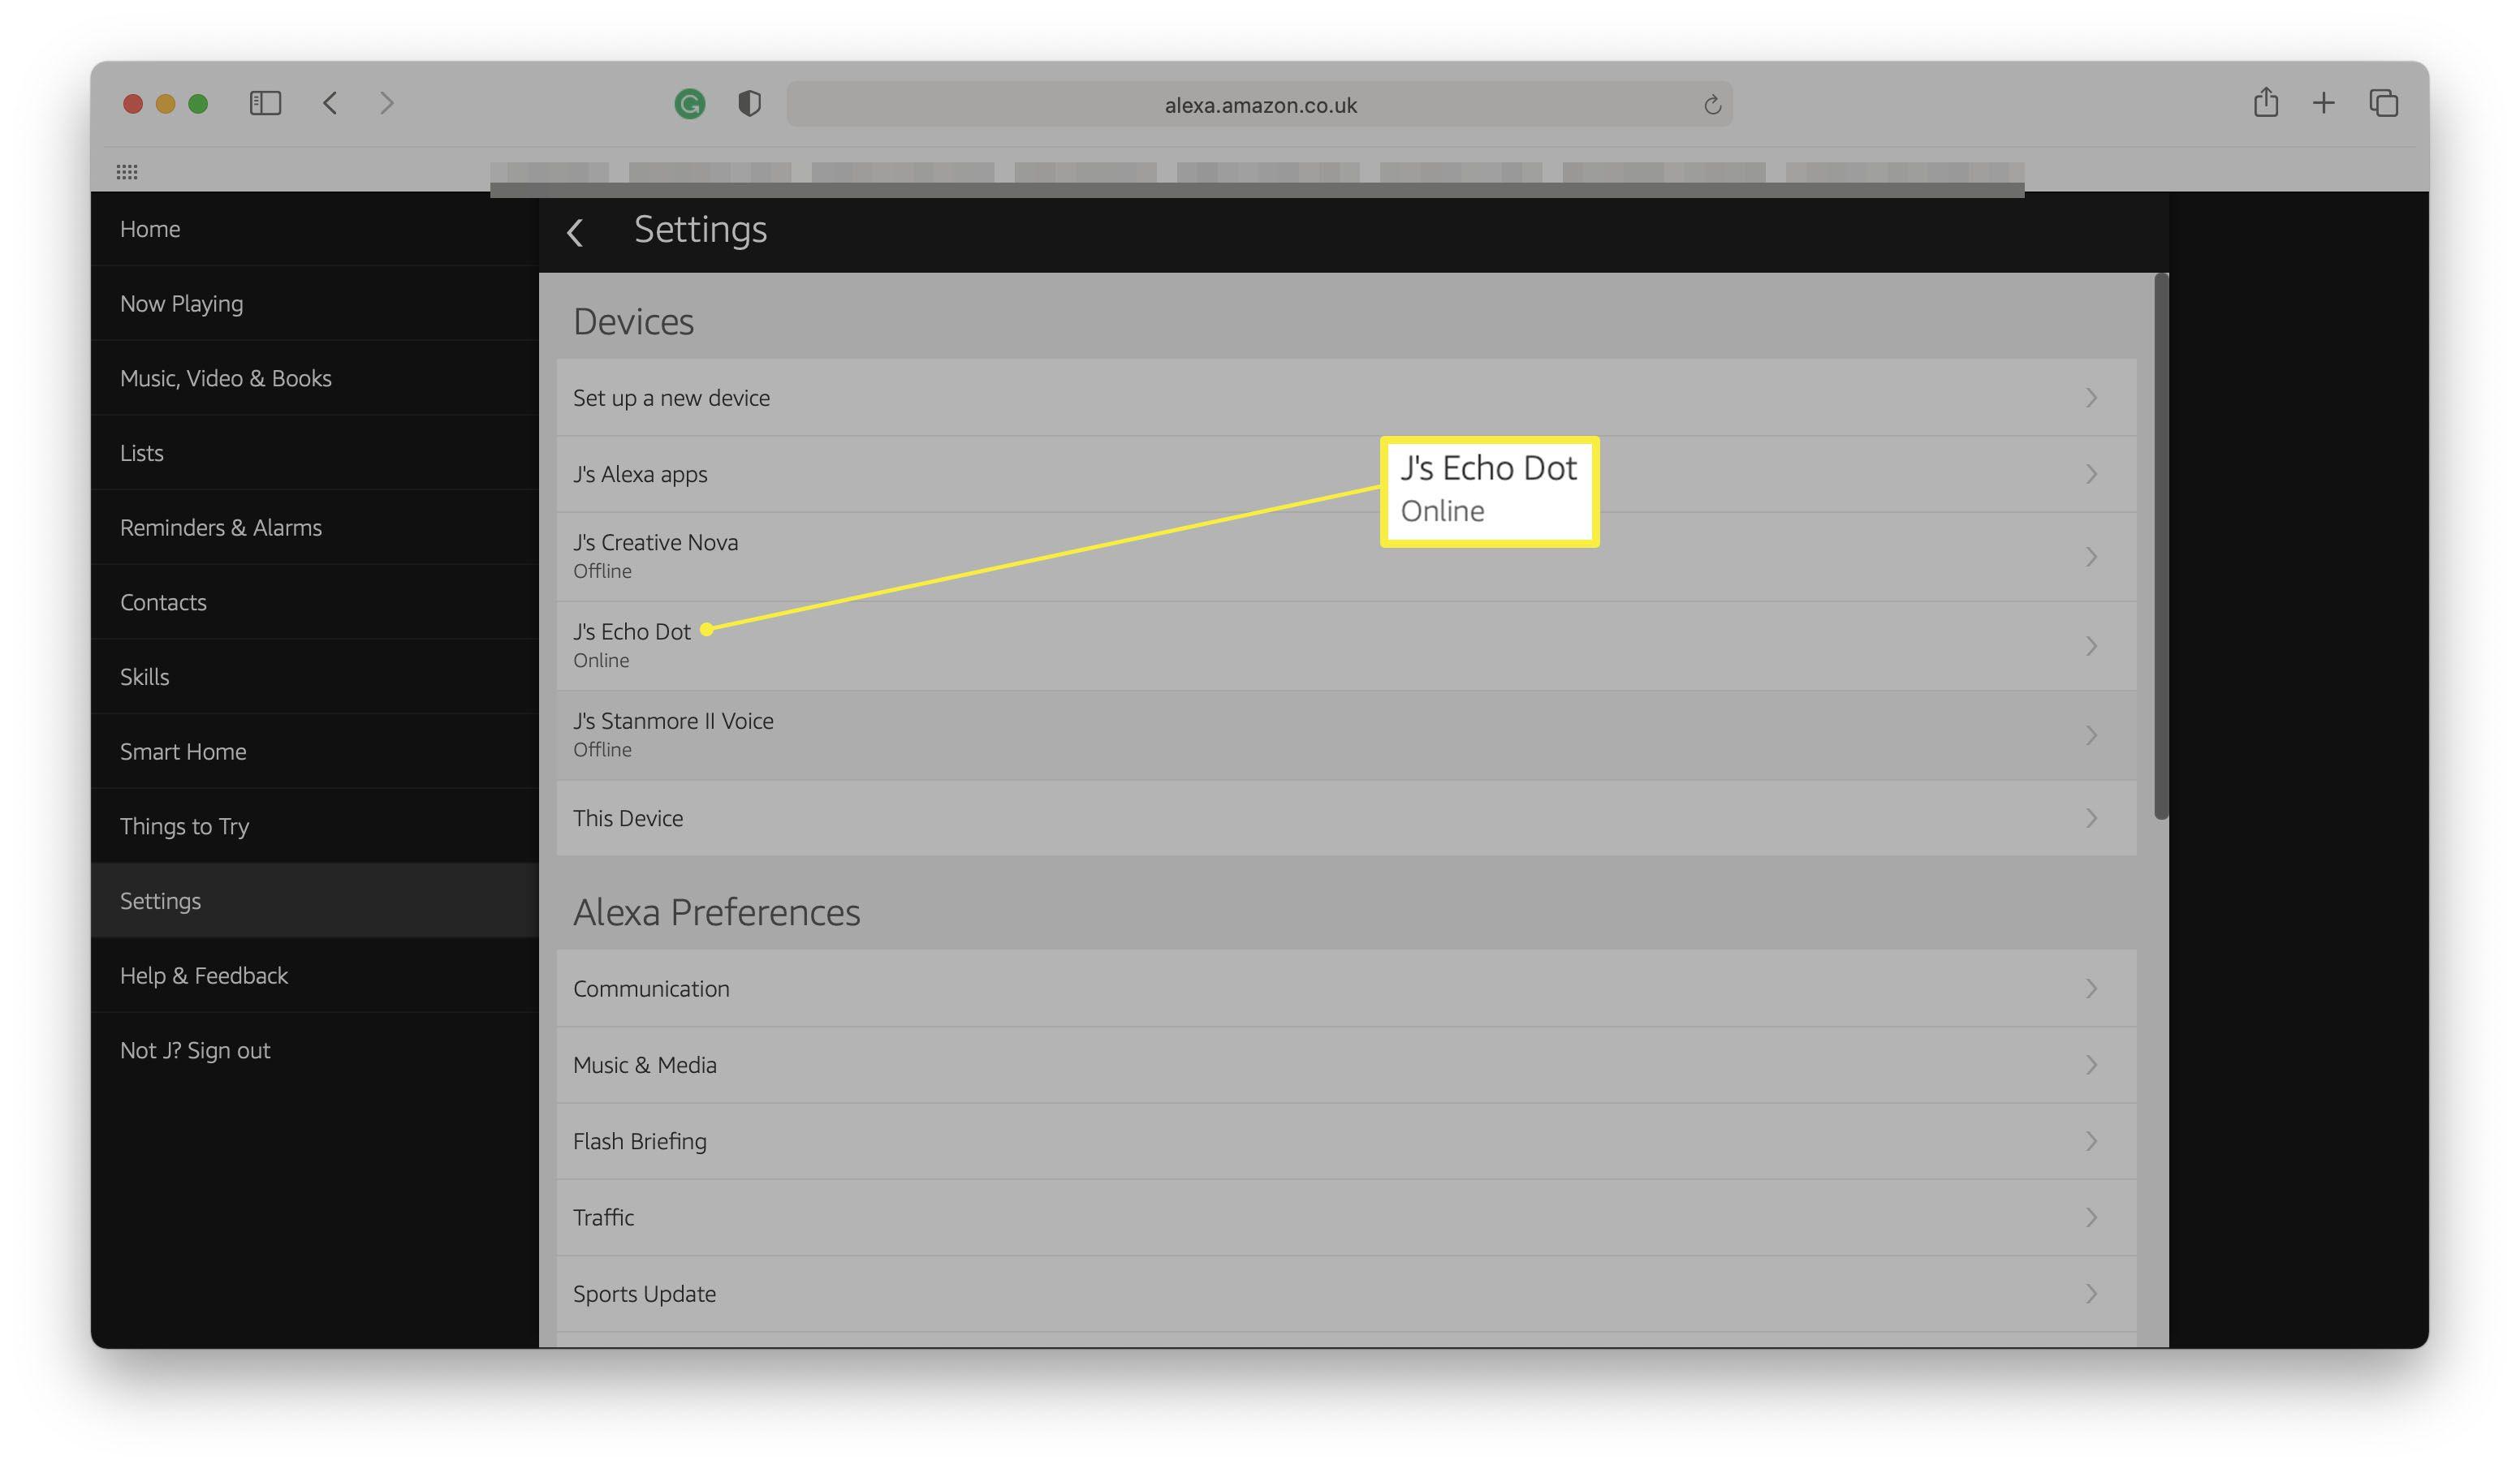 Alexa website with Alexa device highlighted